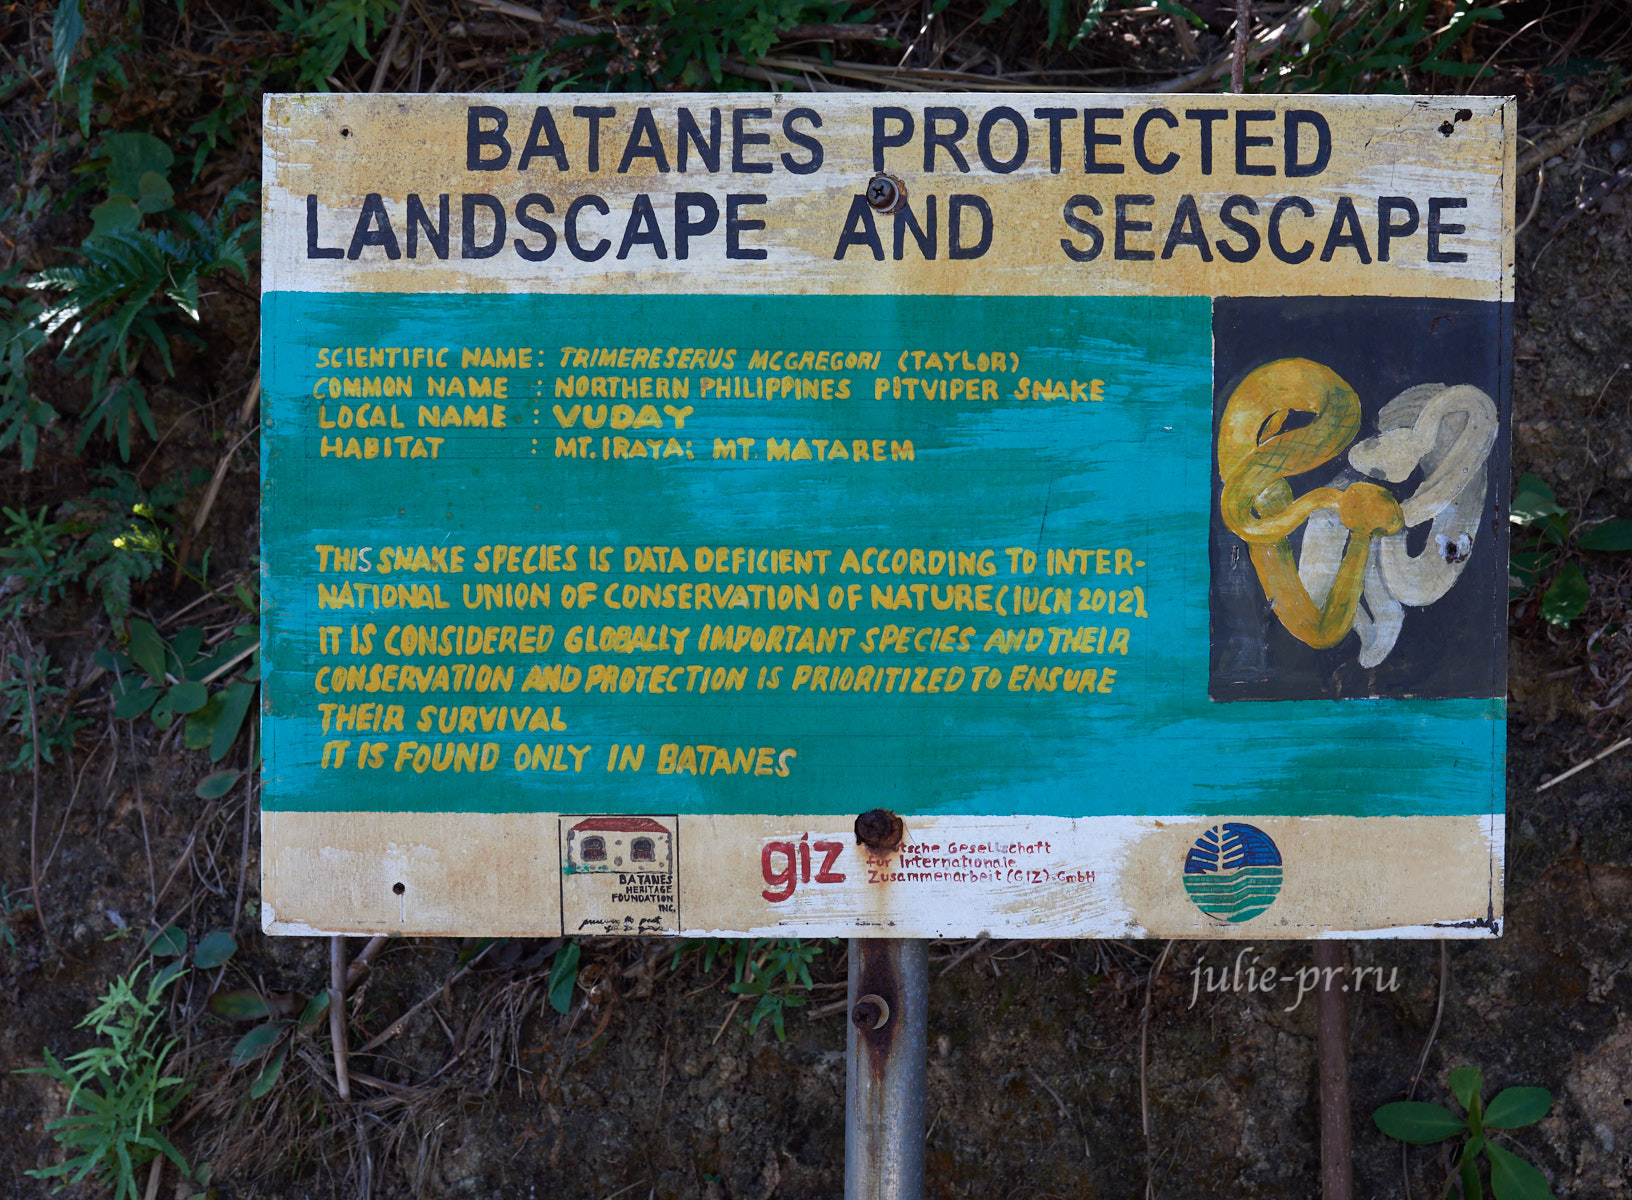 Филиппины, острова Батанес, Northern Philippines Pitviper